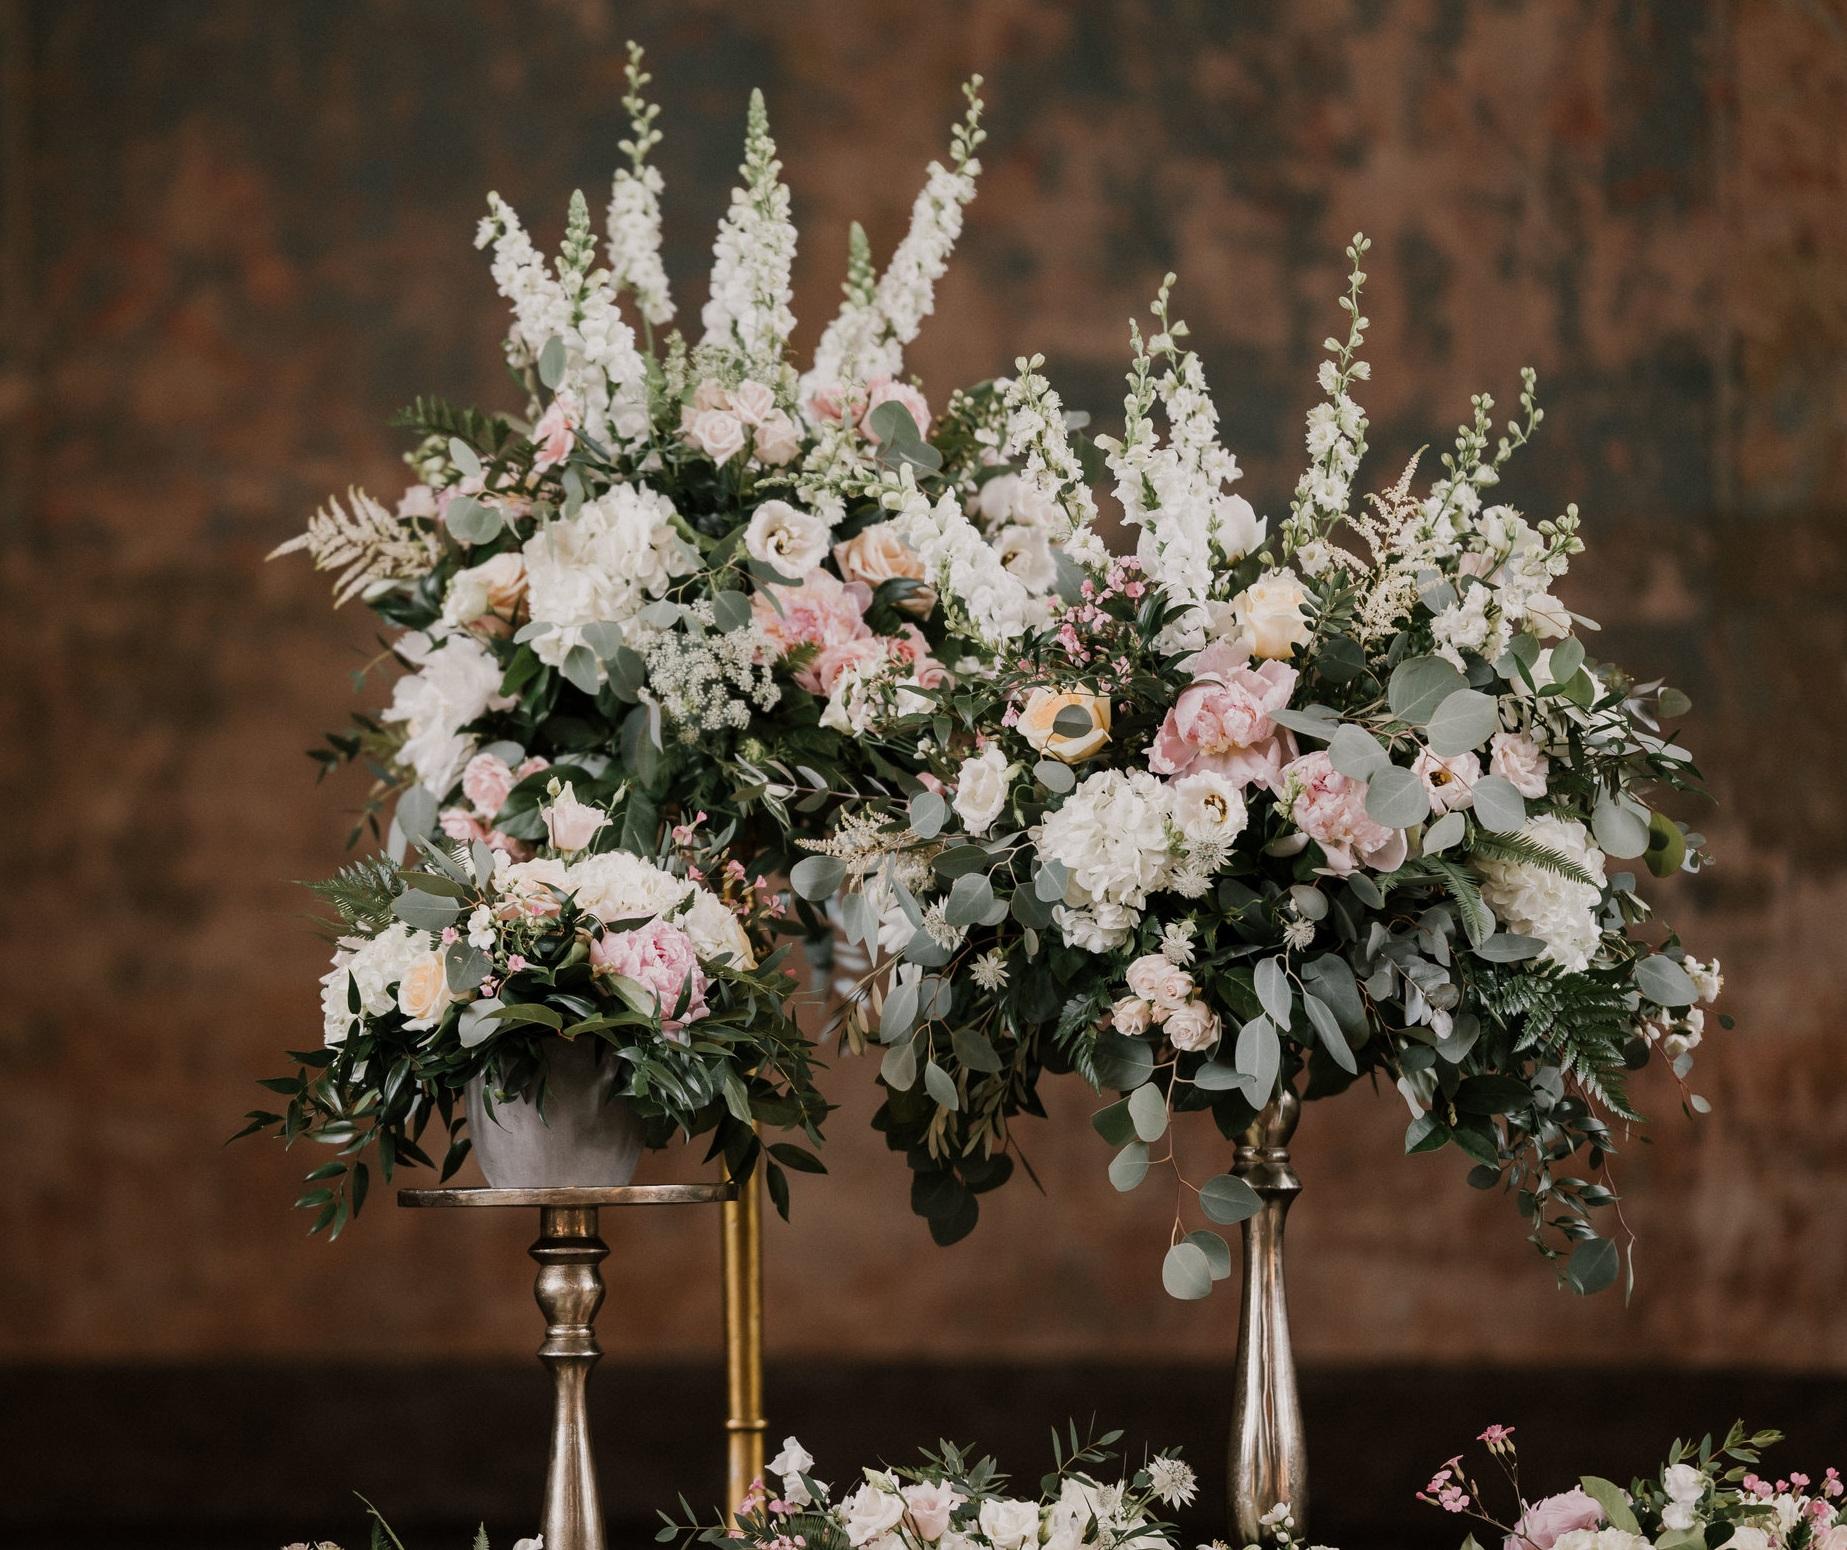 samantha-joy-events-monastery-event-center-cincinnati-wedding-planner-robin-wood-florist-ceremony.jpg